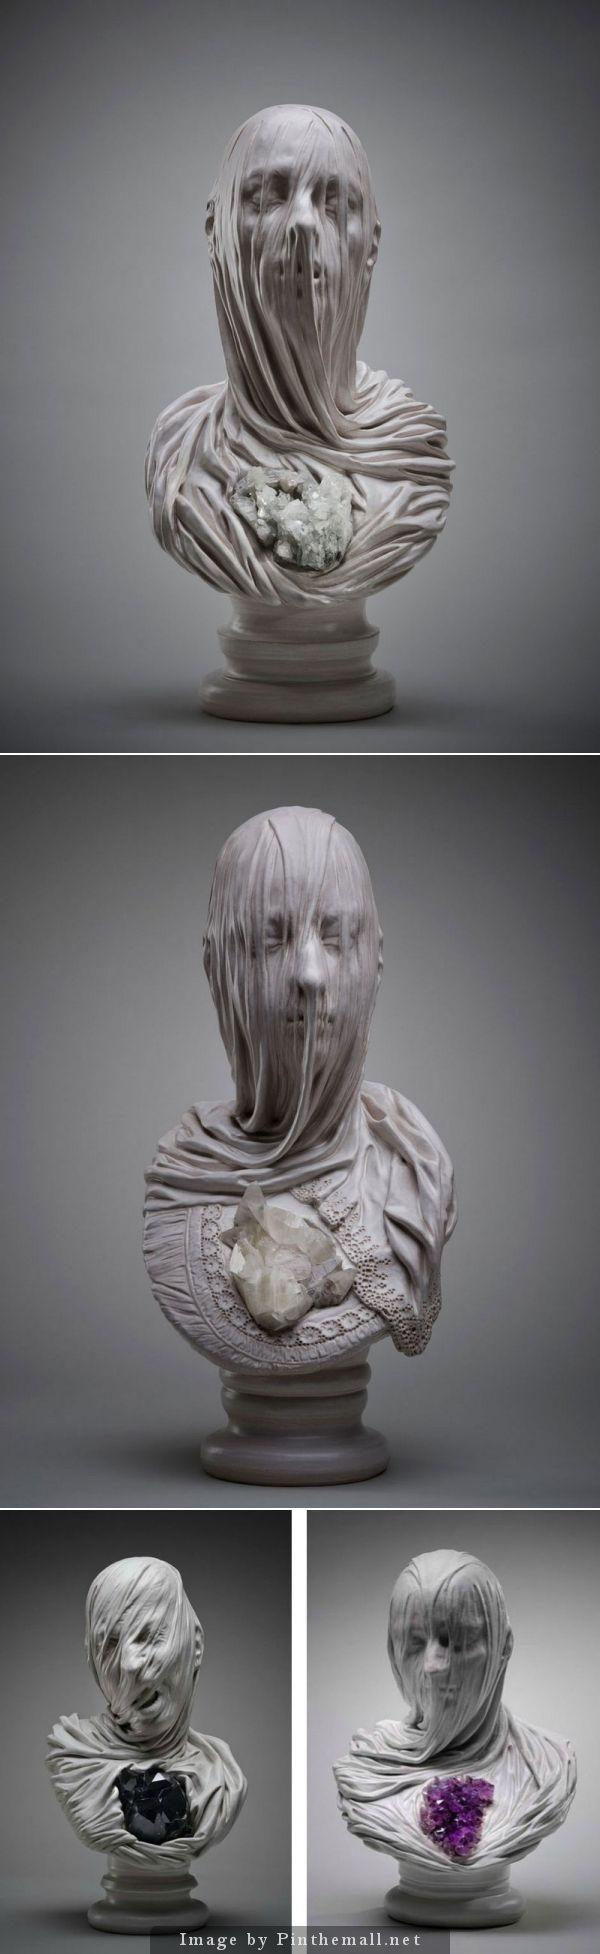 Livio Scarpella - Veiled Souls